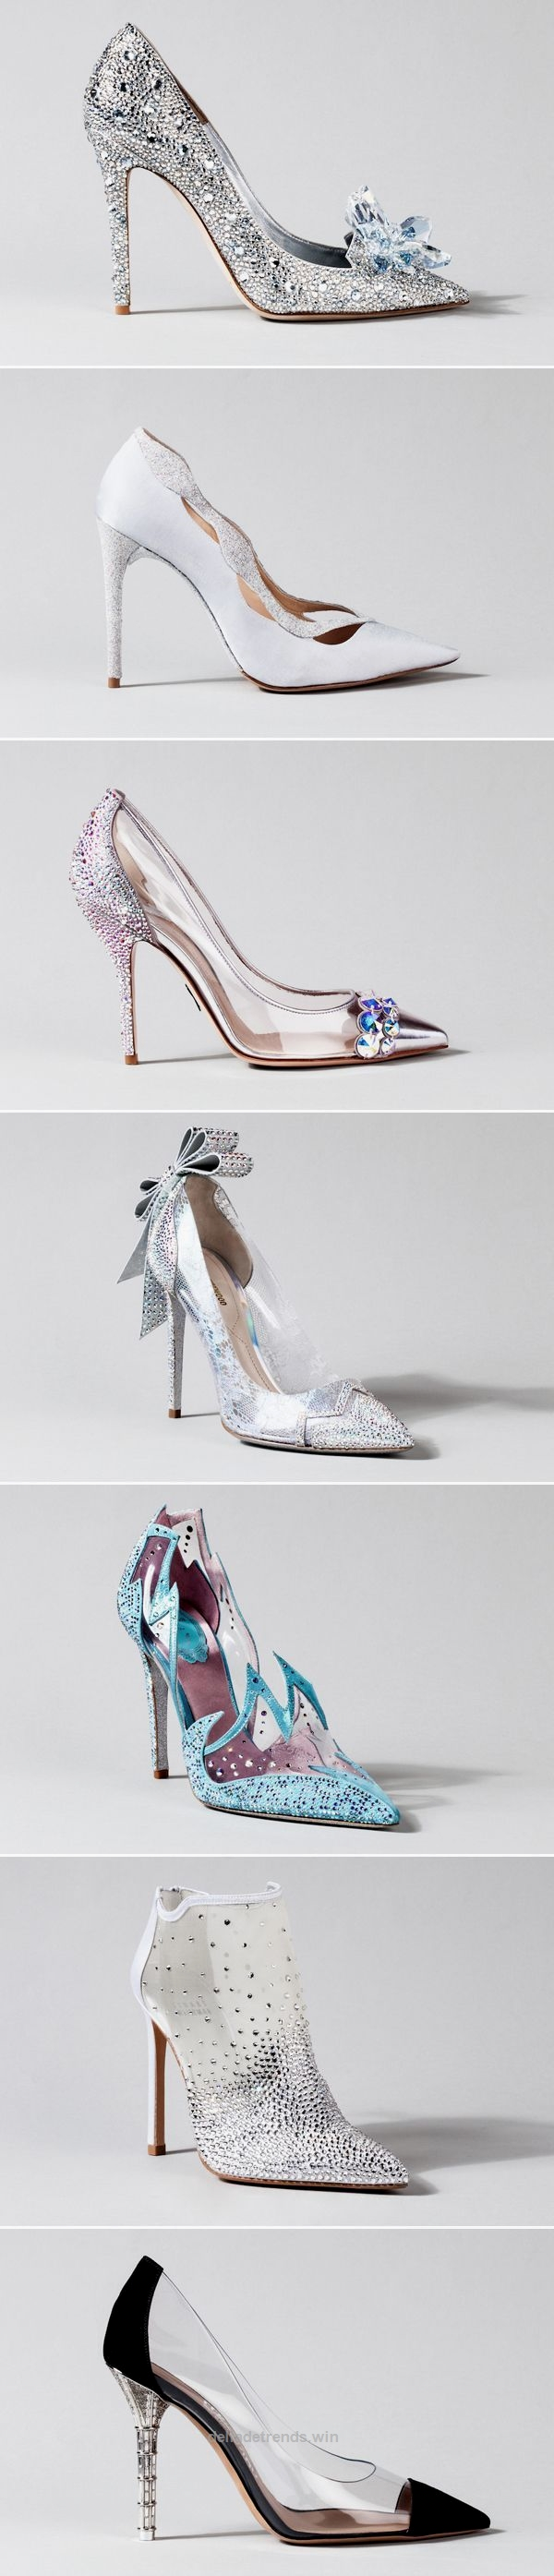 15 Stunning CinderellaInspired Wedding Shoes! Praise